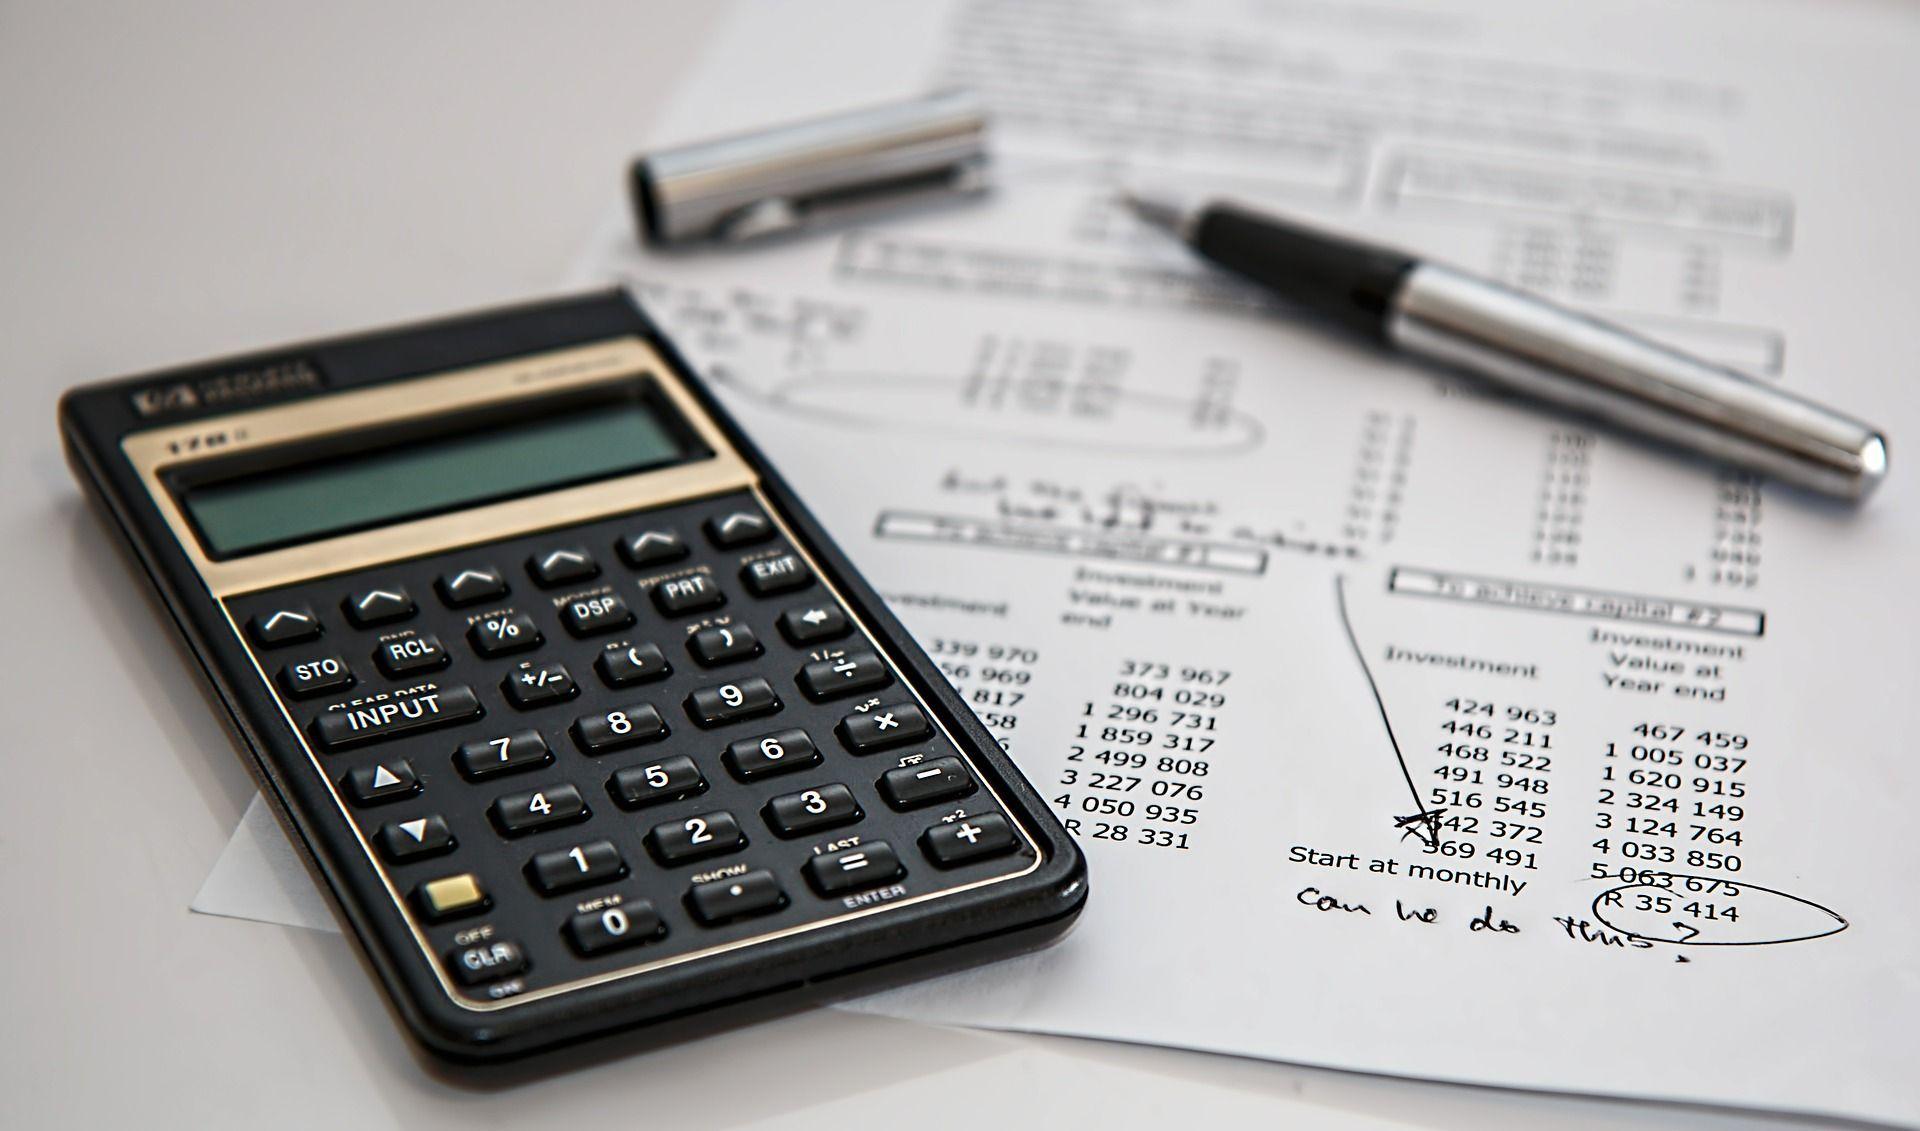 Renters insurance guide Best renters insurance, Renters